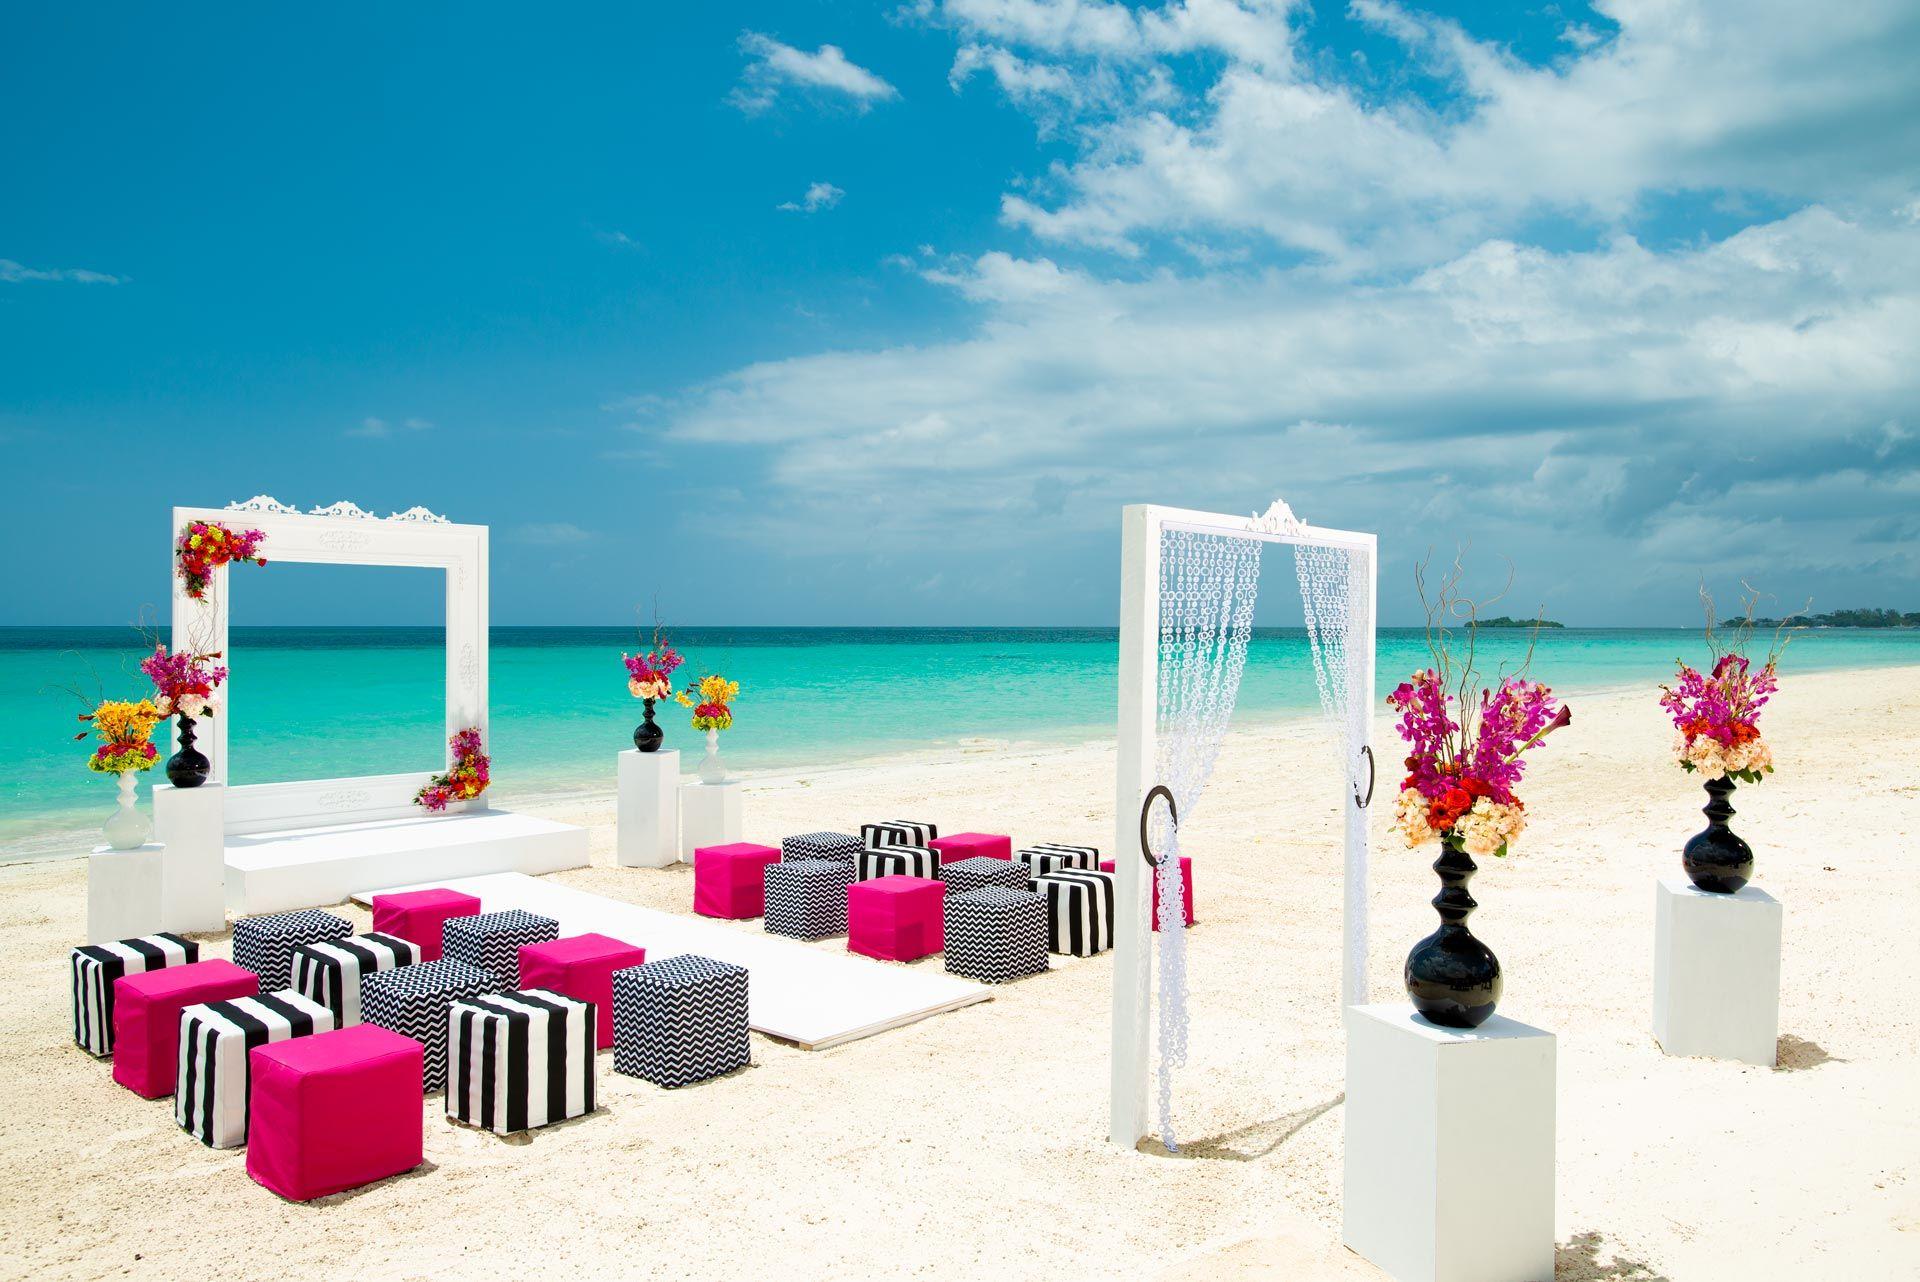 jamaica destination wedding packages,